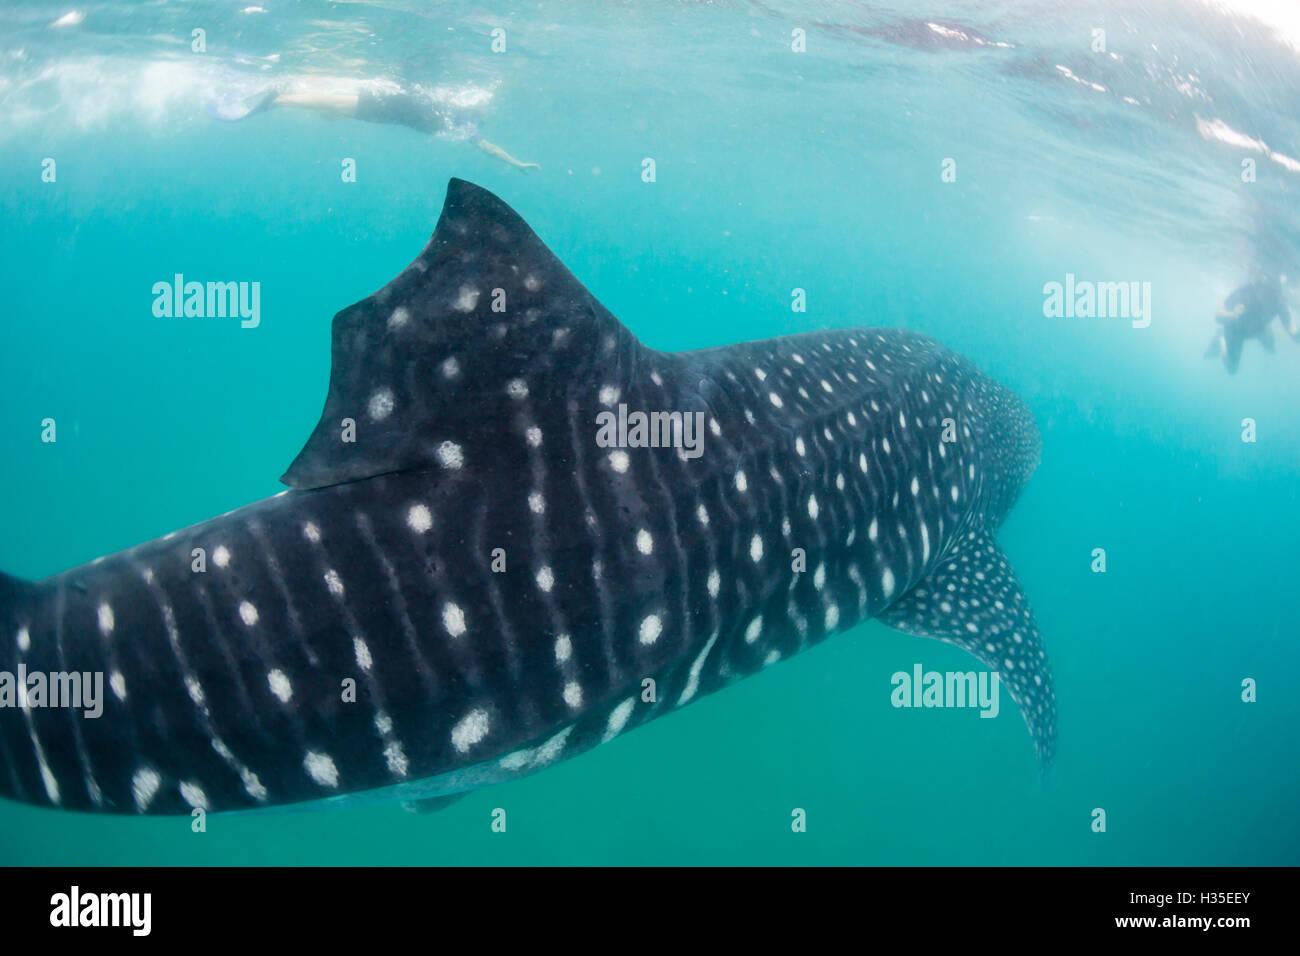 Whale shark (Rhincodon typus), underwater with snorkelers off El Mogote, near La Paz, Baja California Sur, Mexico - Stock Image